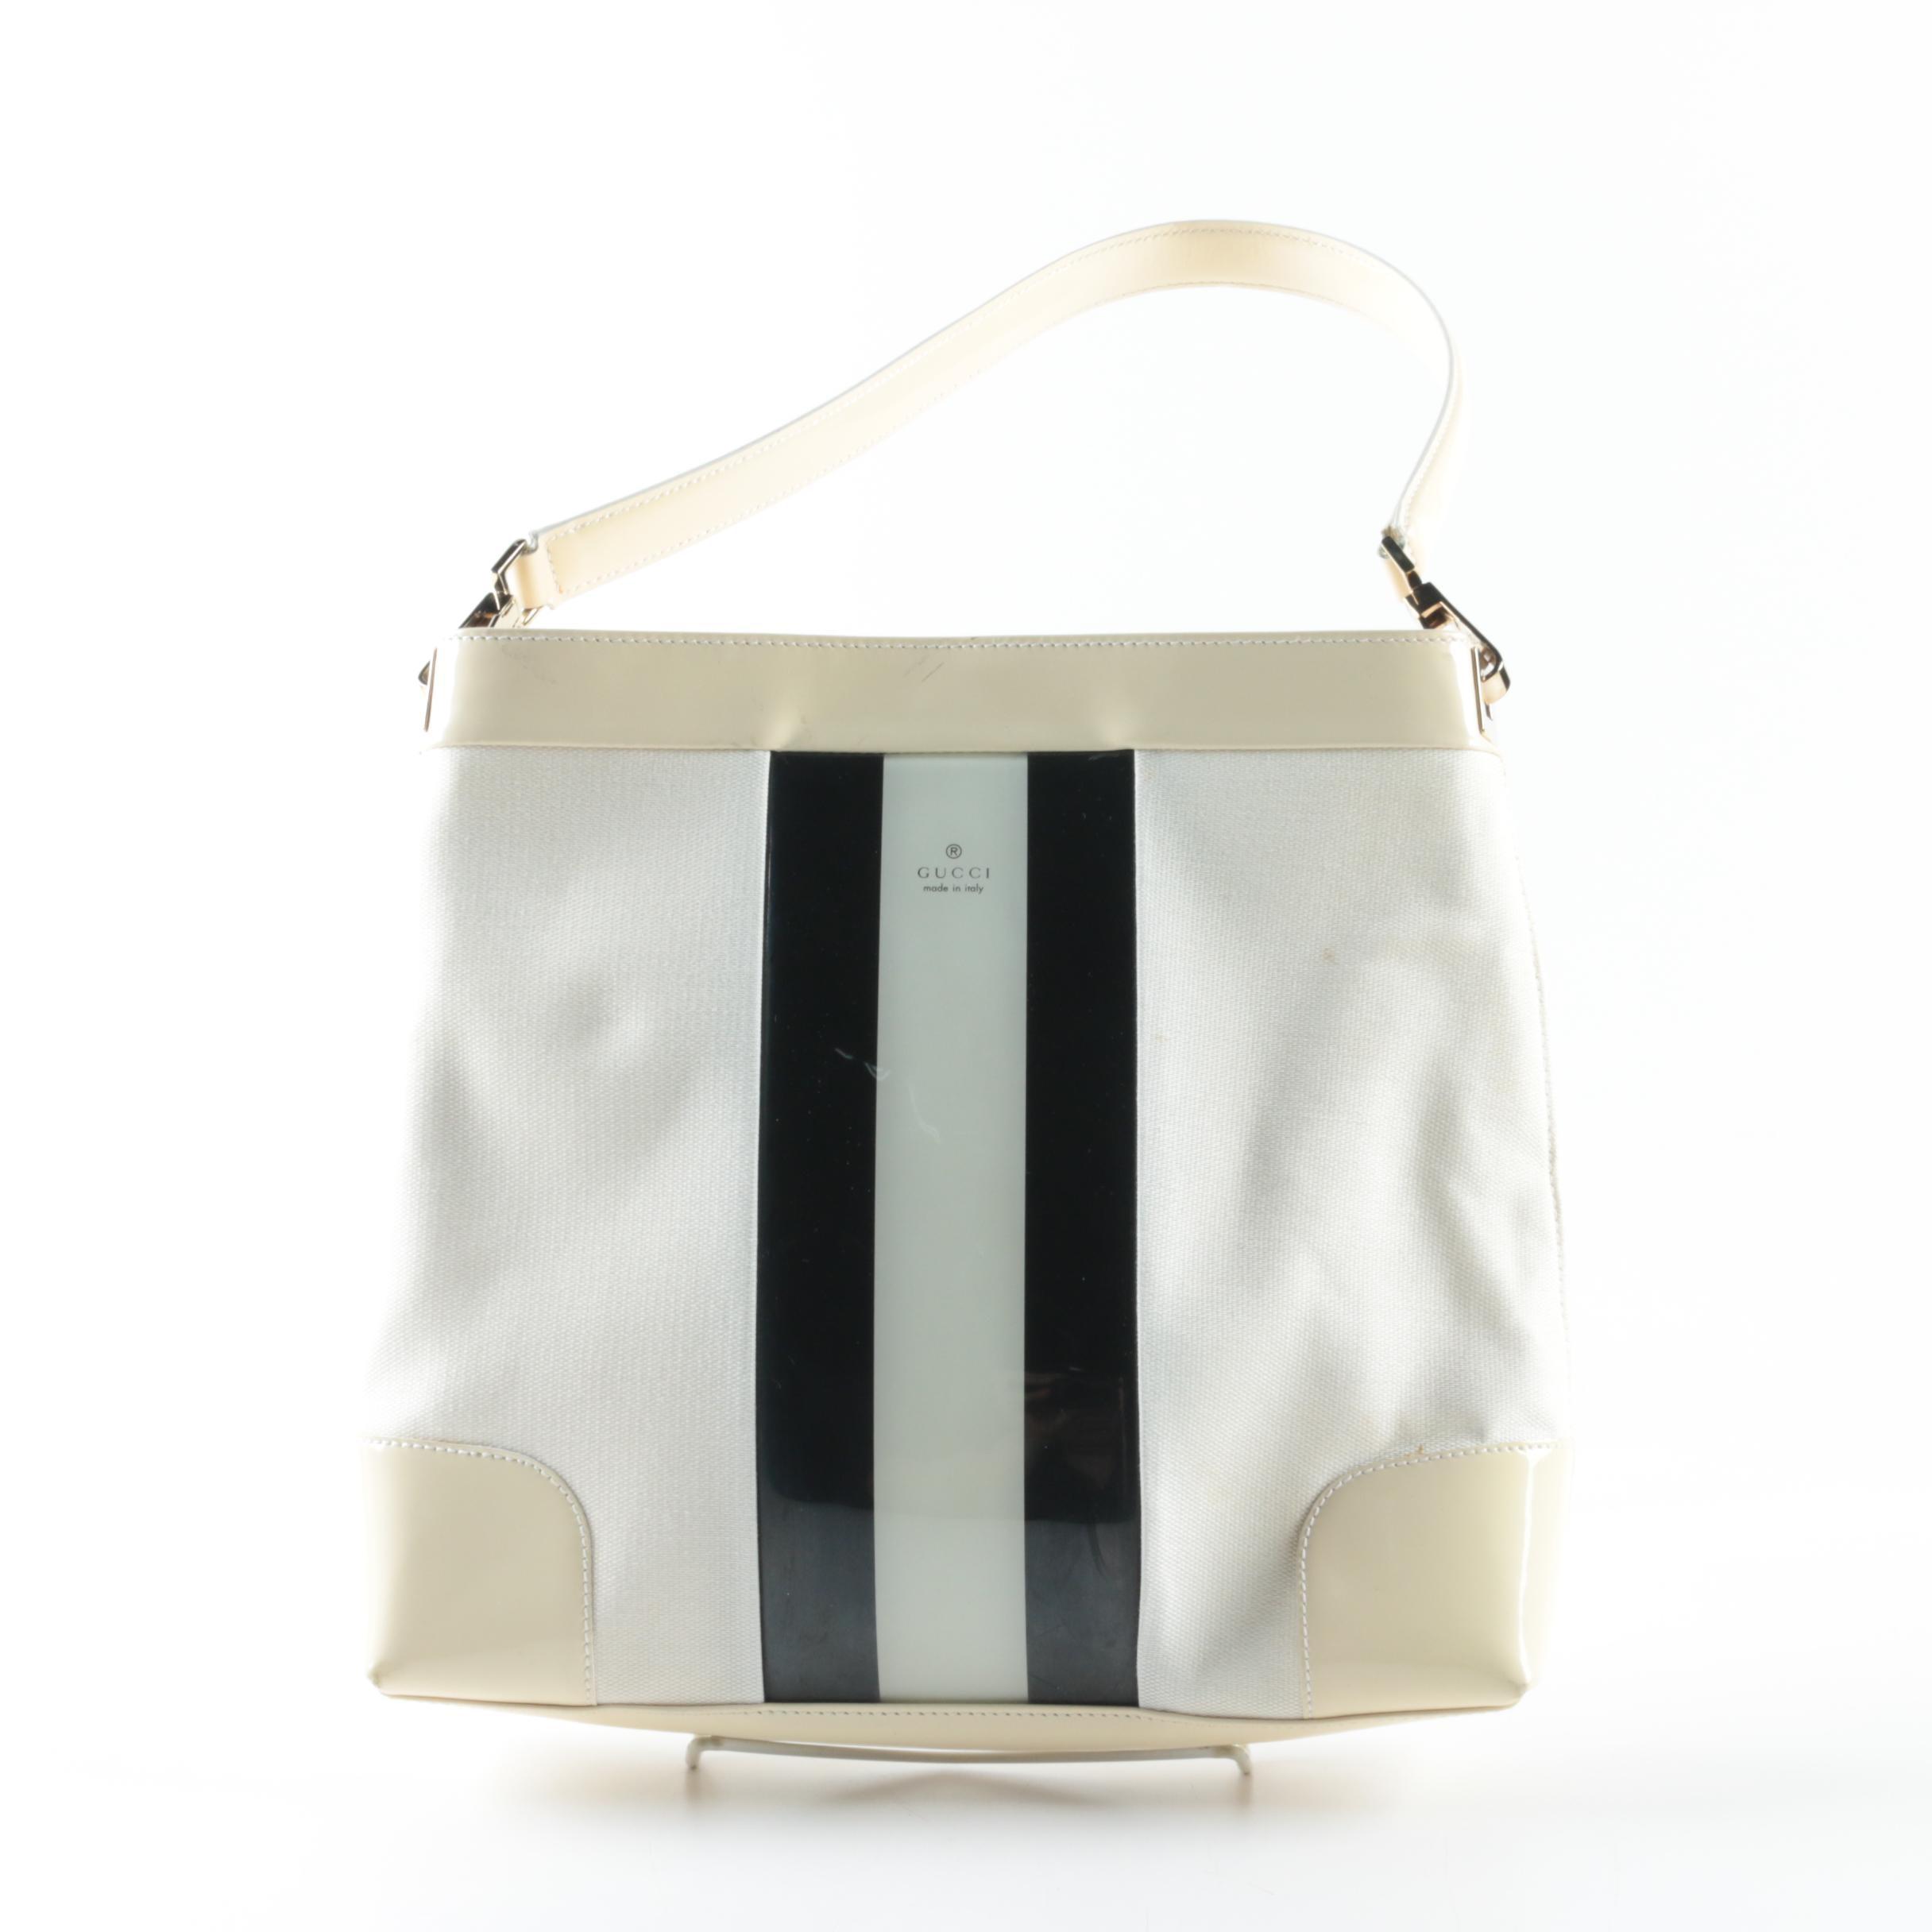 Gucci Signature Stripe Canvas and Patent Leather Shoulder Bag